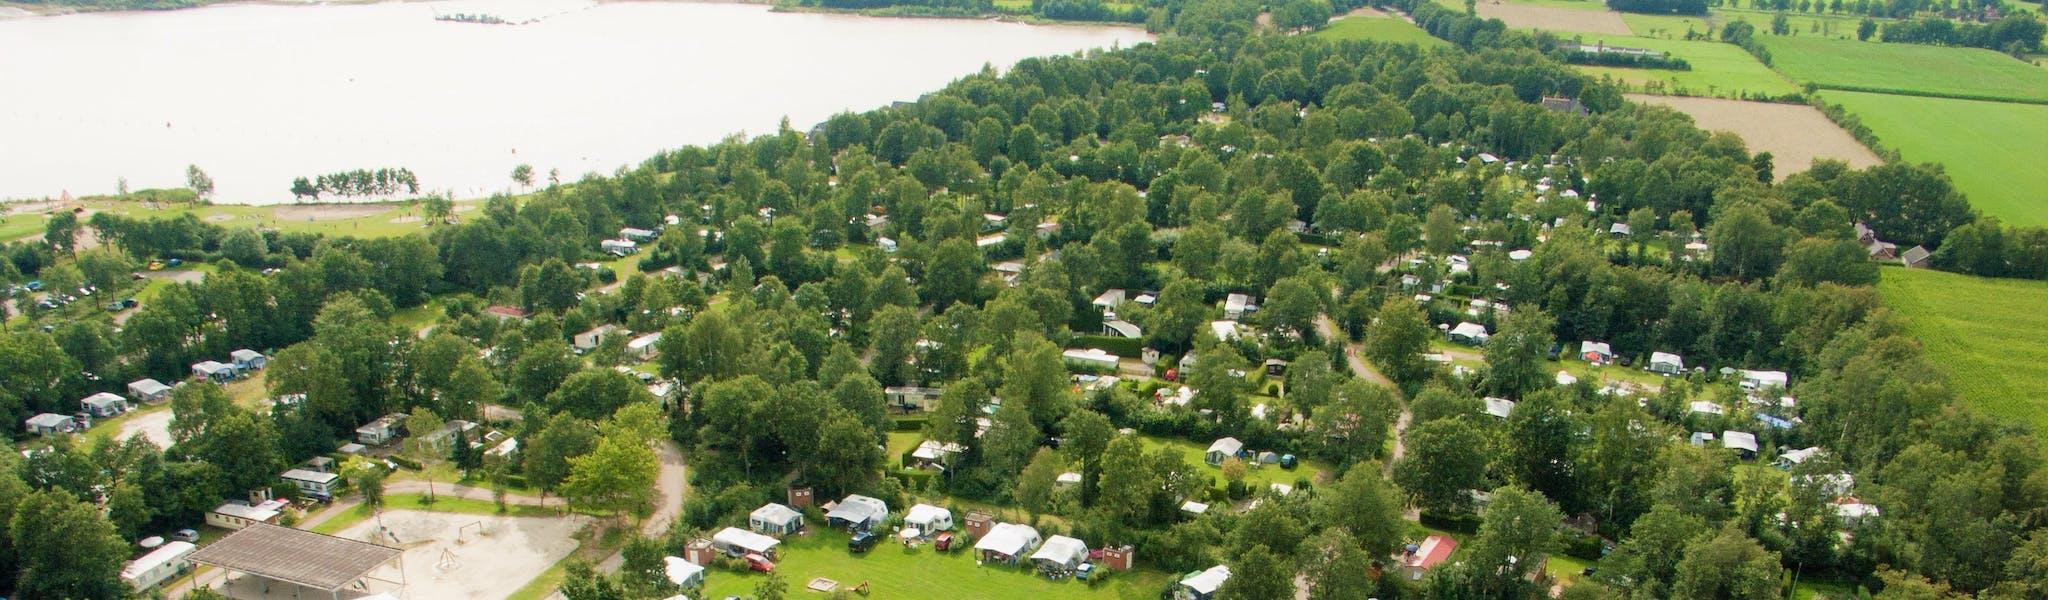 Camping 't Strandheem meer